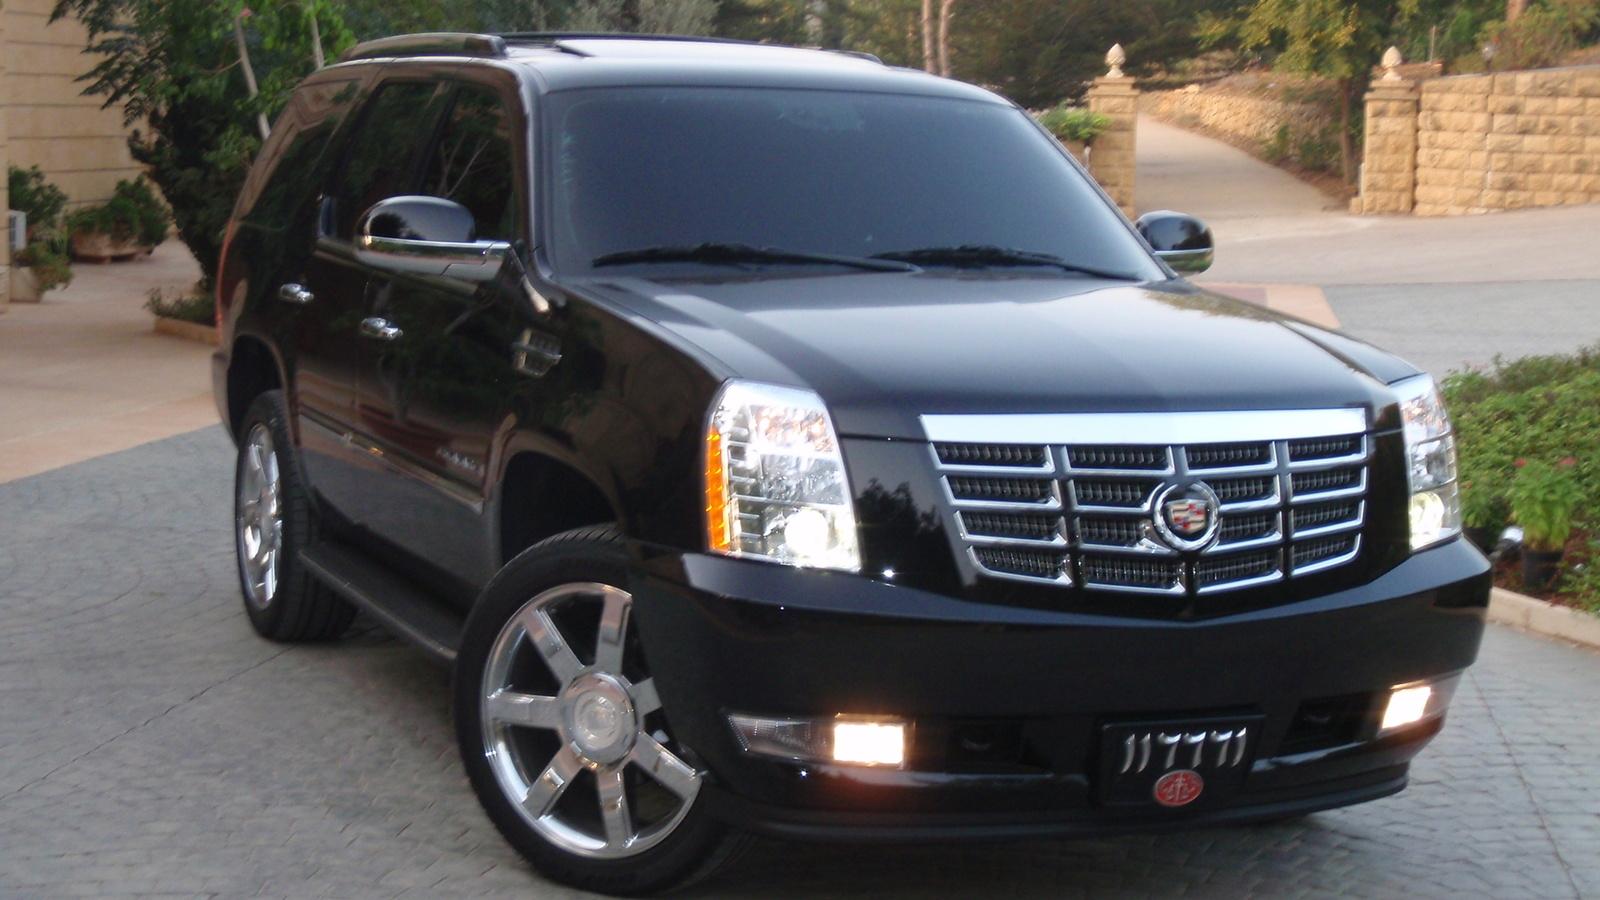 2008 cadillac escalade ext prices specs reviews motor autos post. Black Bedroom Furniture Sets. Home Design Ideas